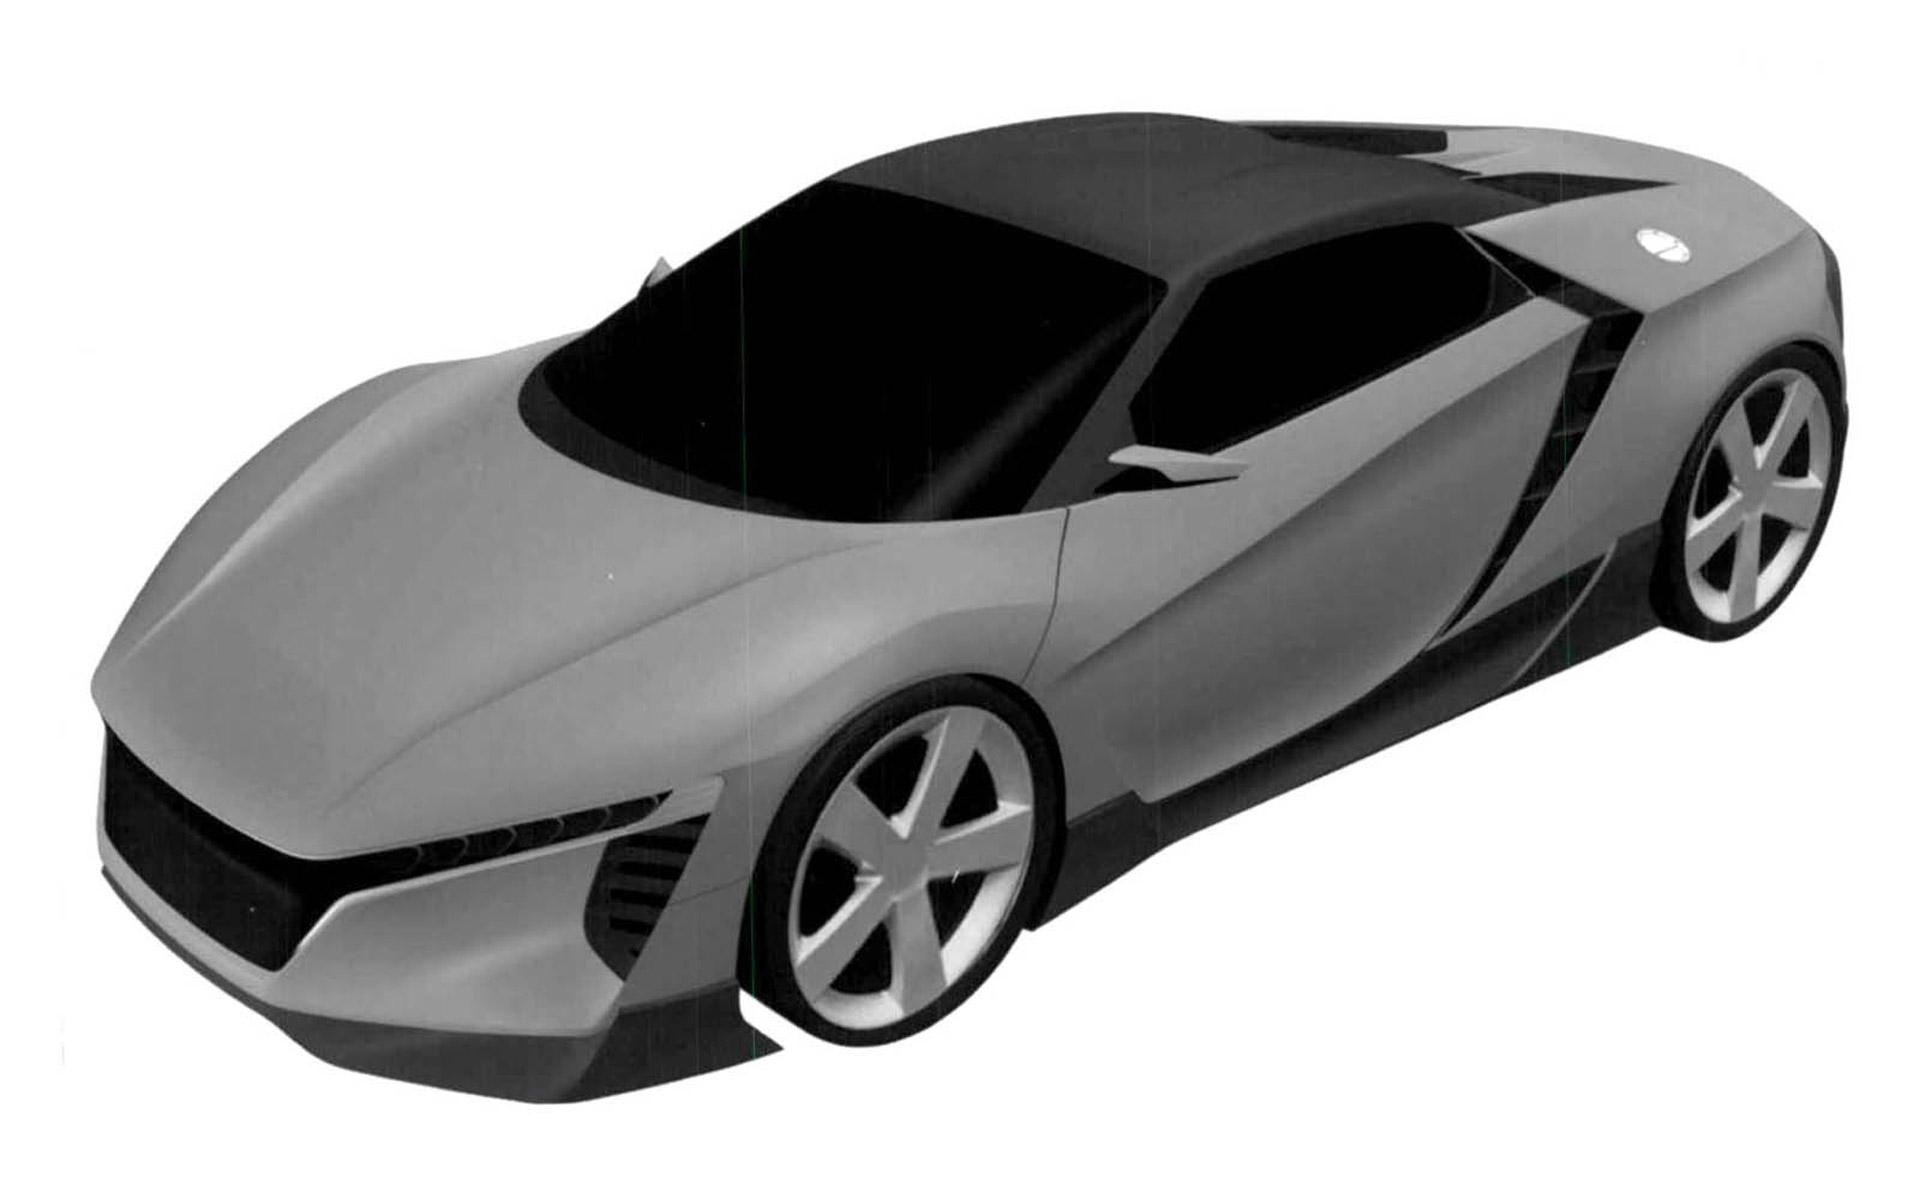 Honda Mid Engine Sports Car To Pack 1 5 Liter Turbo